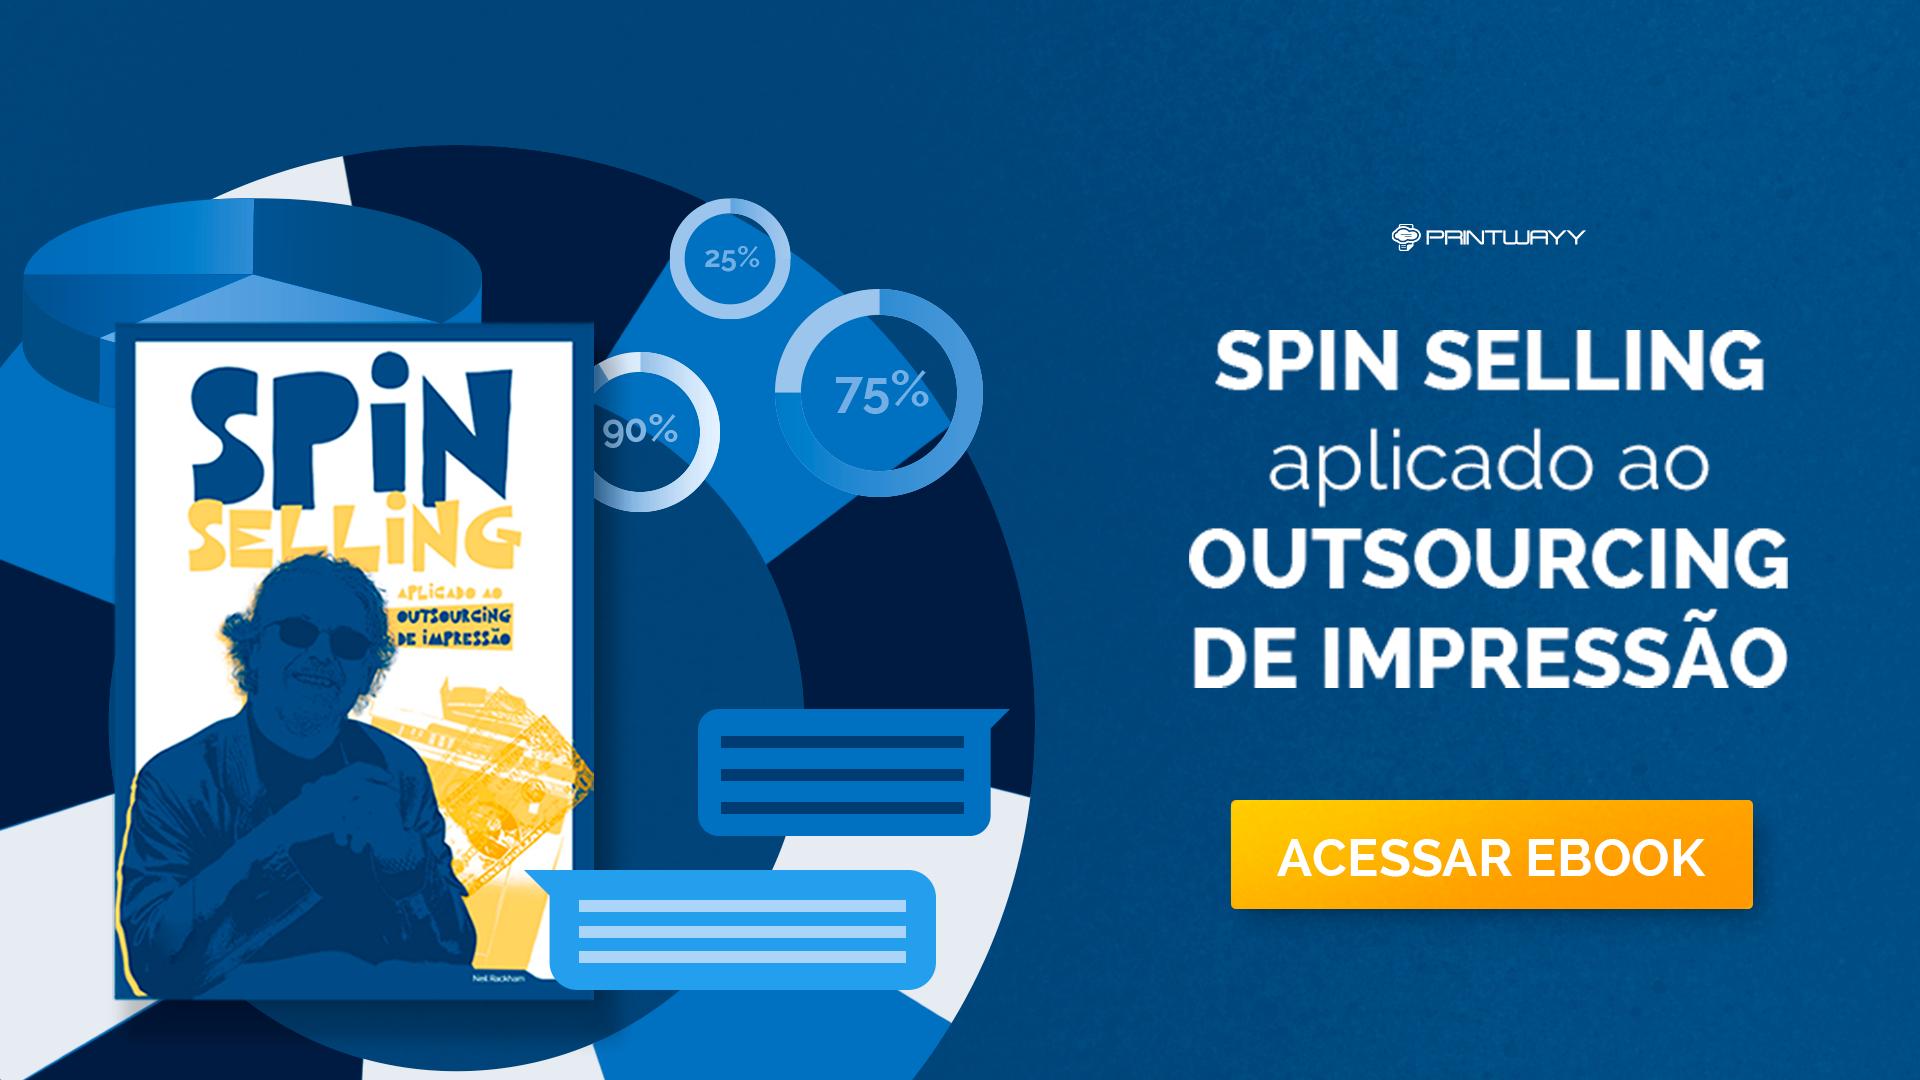 Convite para acessar o material Ebook SPIN Selling Aplicado ao Outsourcing de Impressão da PrintWayy.